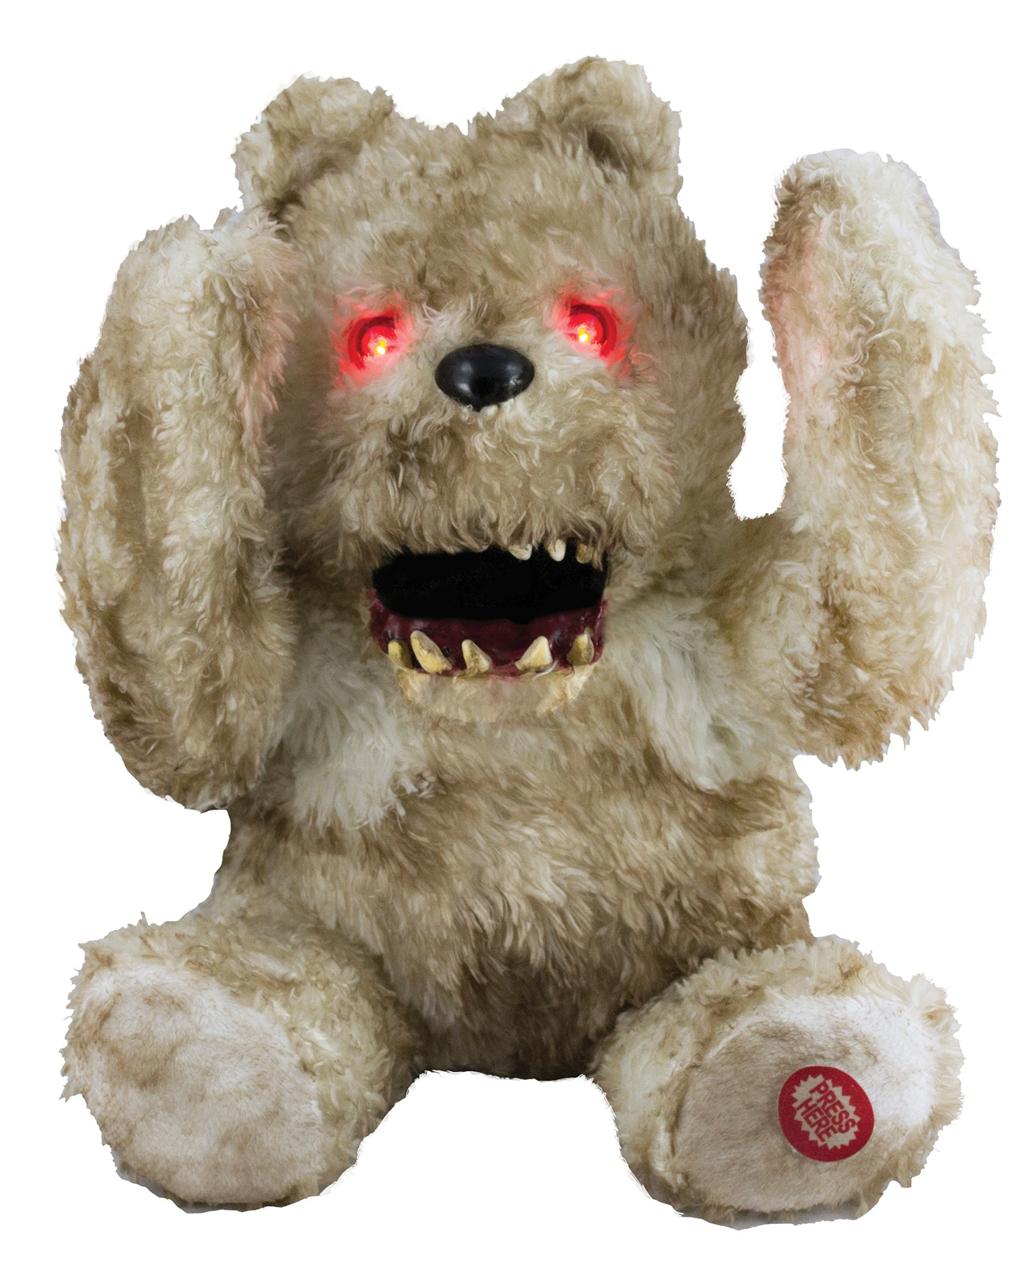 Scary Horror Teddy